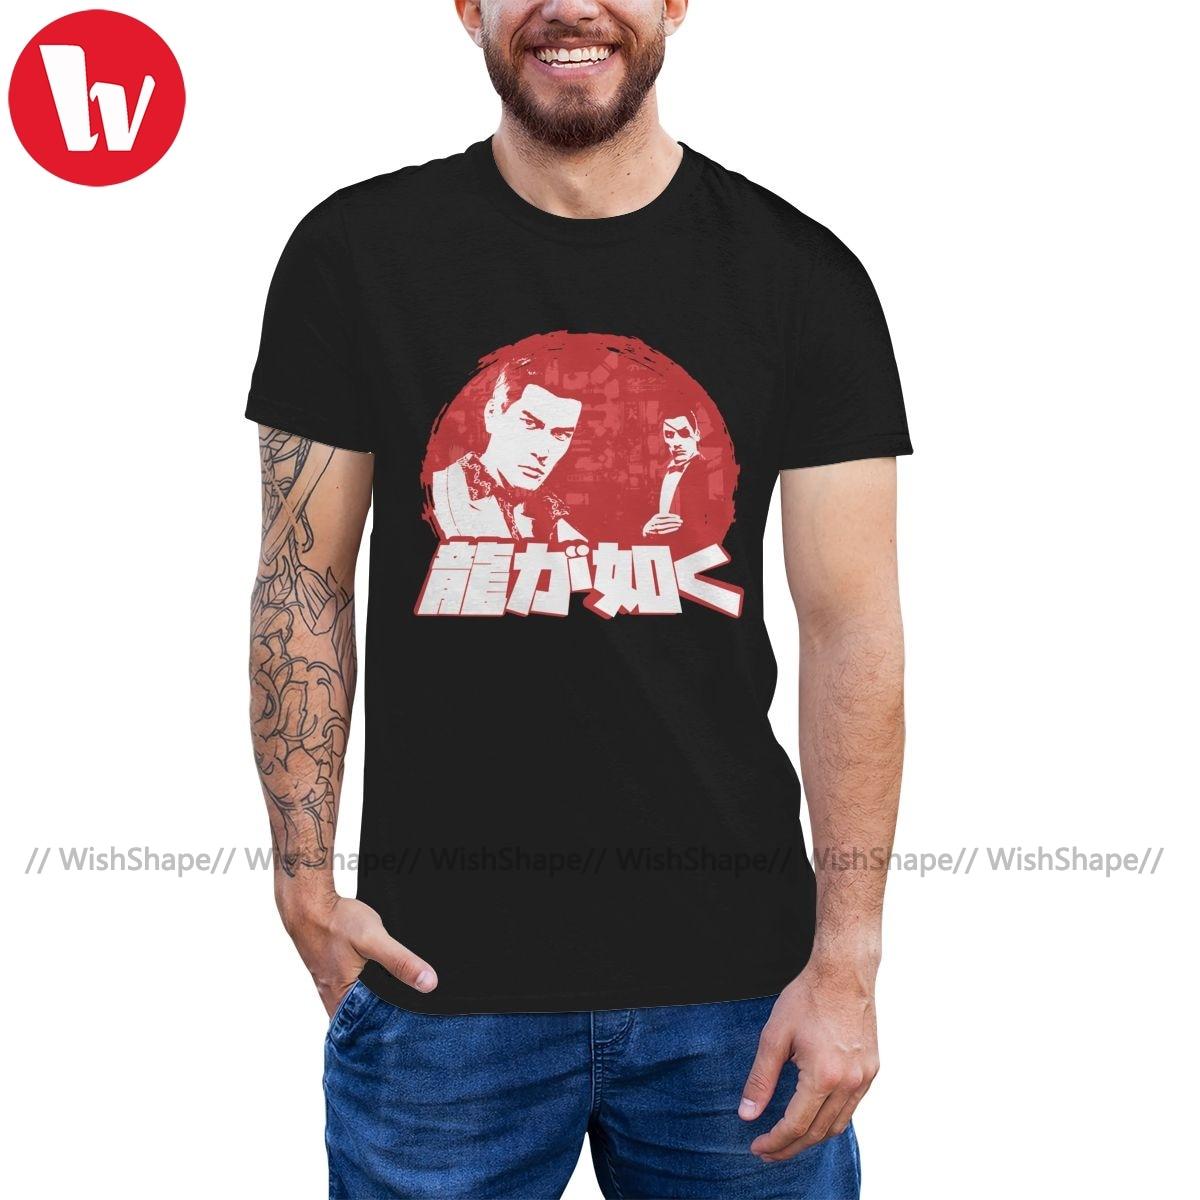 Yakuza t camisa jovem sentimento camiseta 4xl divertido camiseta 100 algodão mangas curtas clássico gráfico masculino tshirt